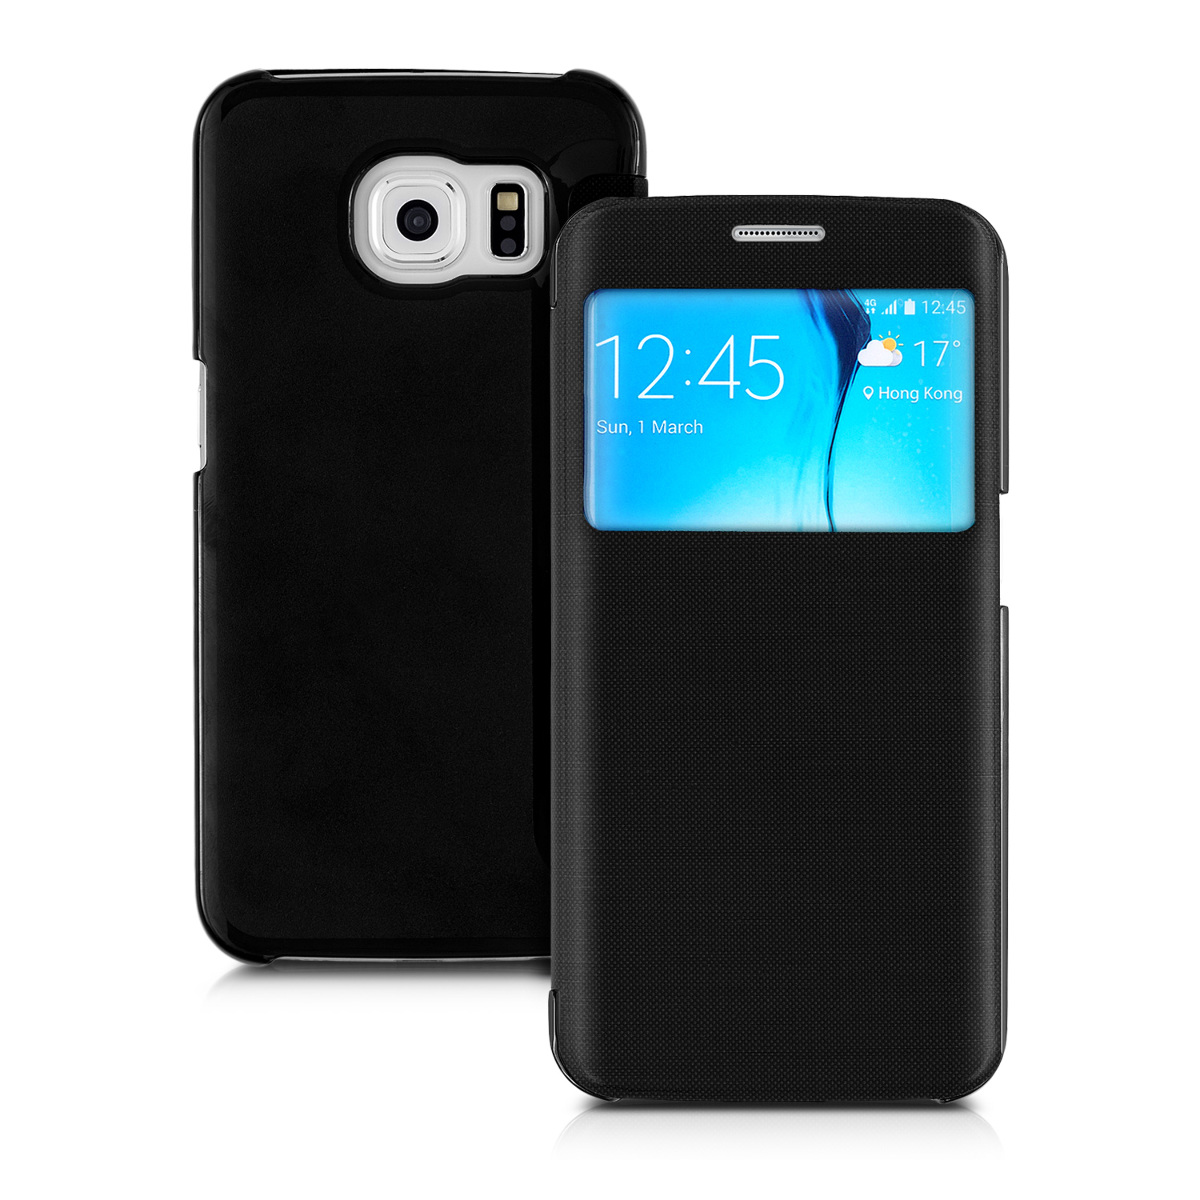 Pouzdro WIN pro Samsung Galaxy S6 Edge černé